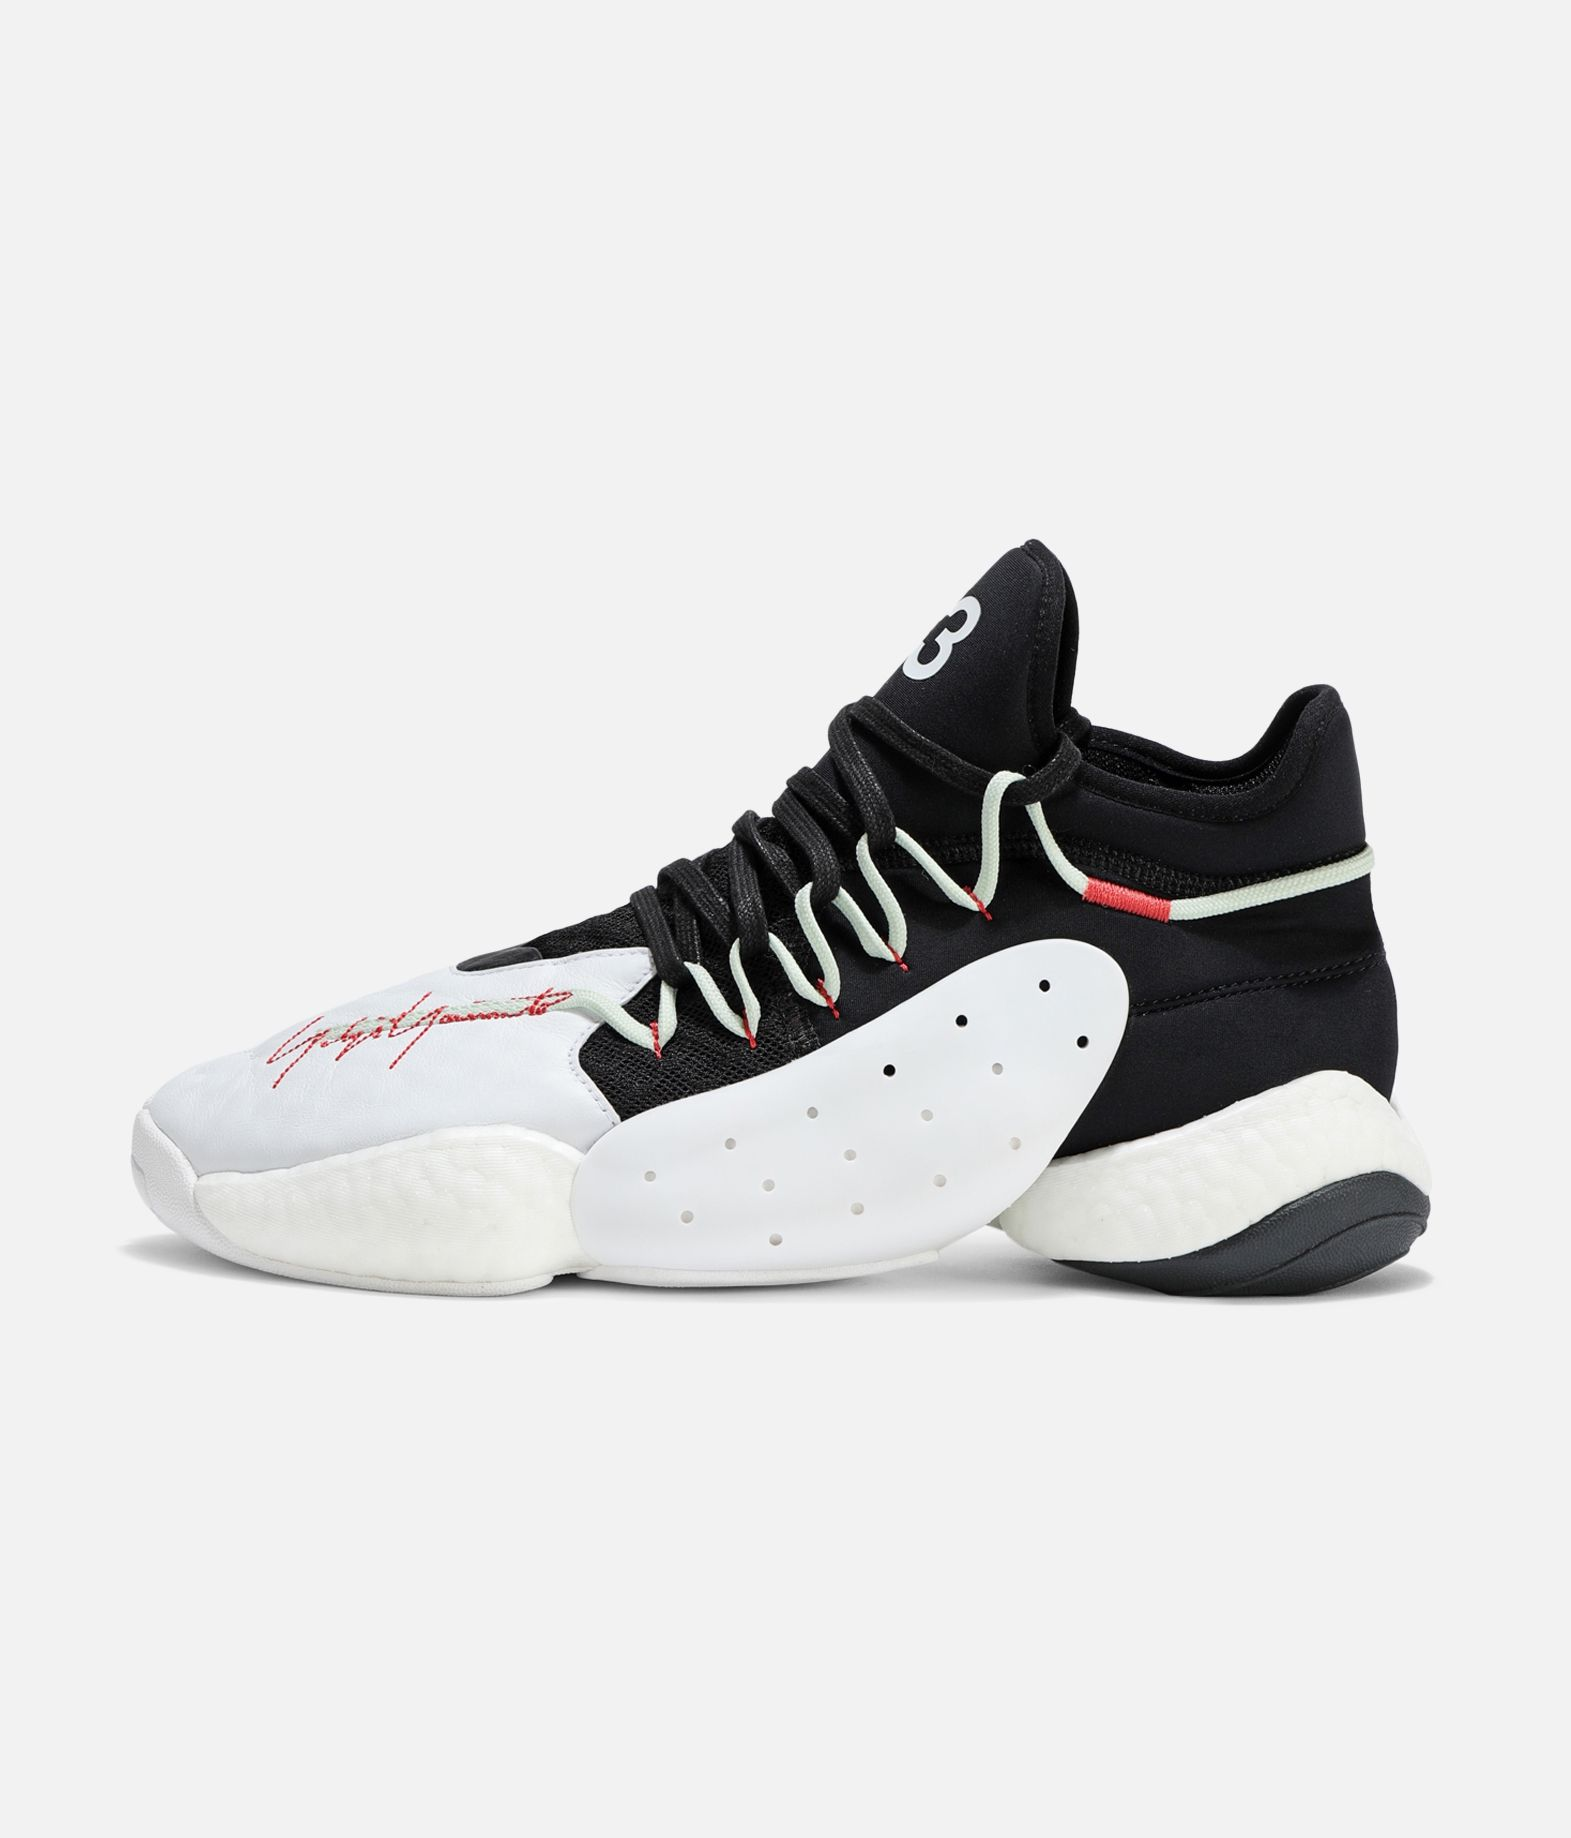 Y-3 Y-3 BYW BBALL Sneakers Man f